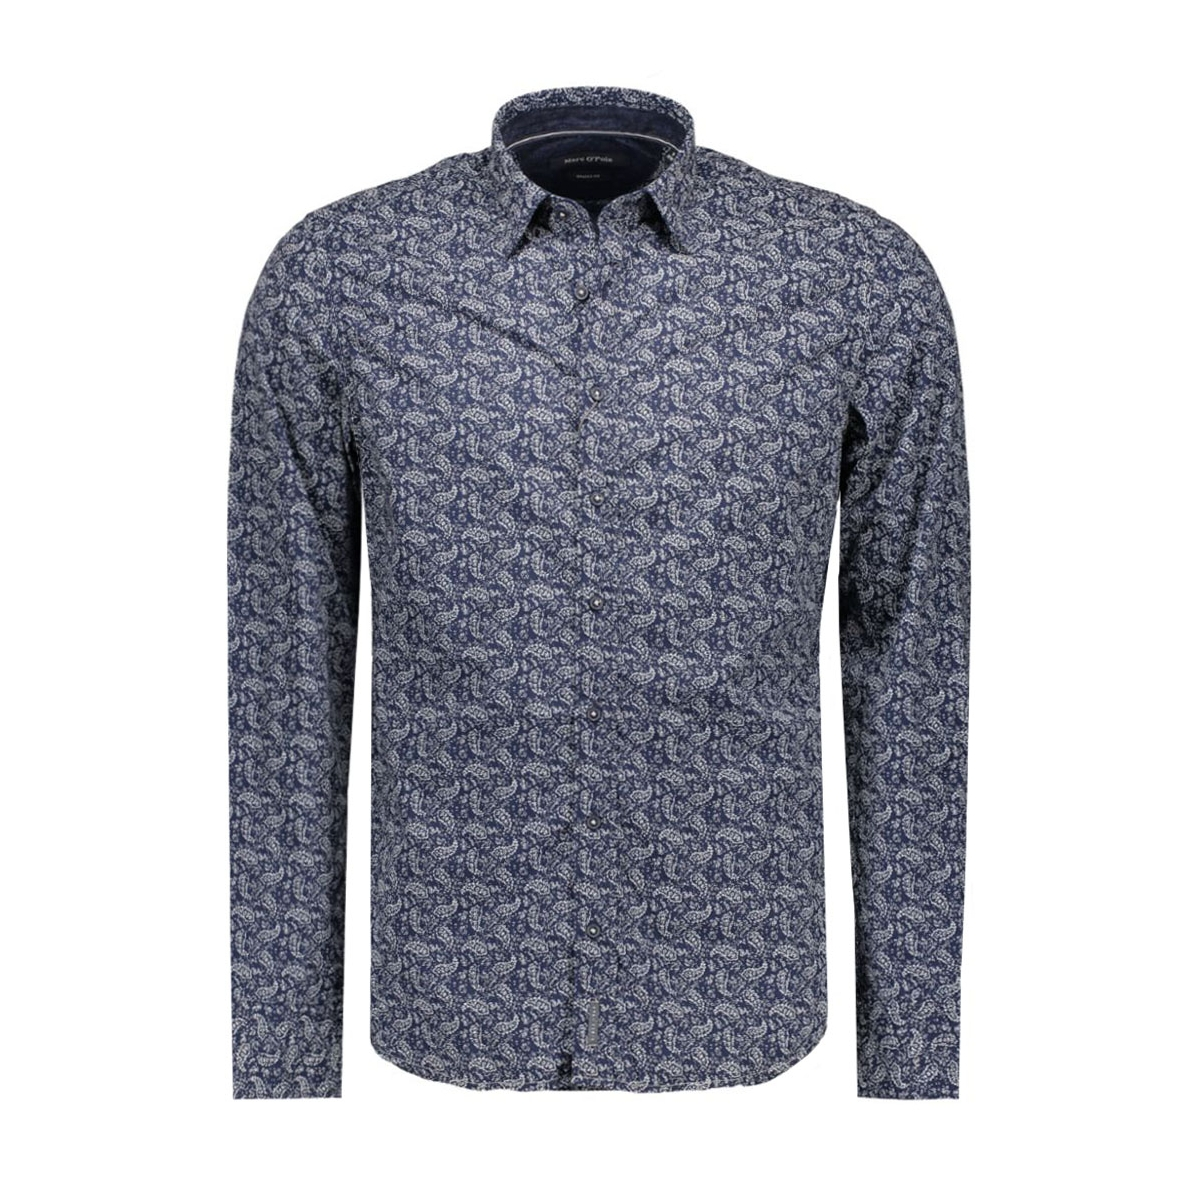 629 0896 42072 marc o`polo overhemd w85